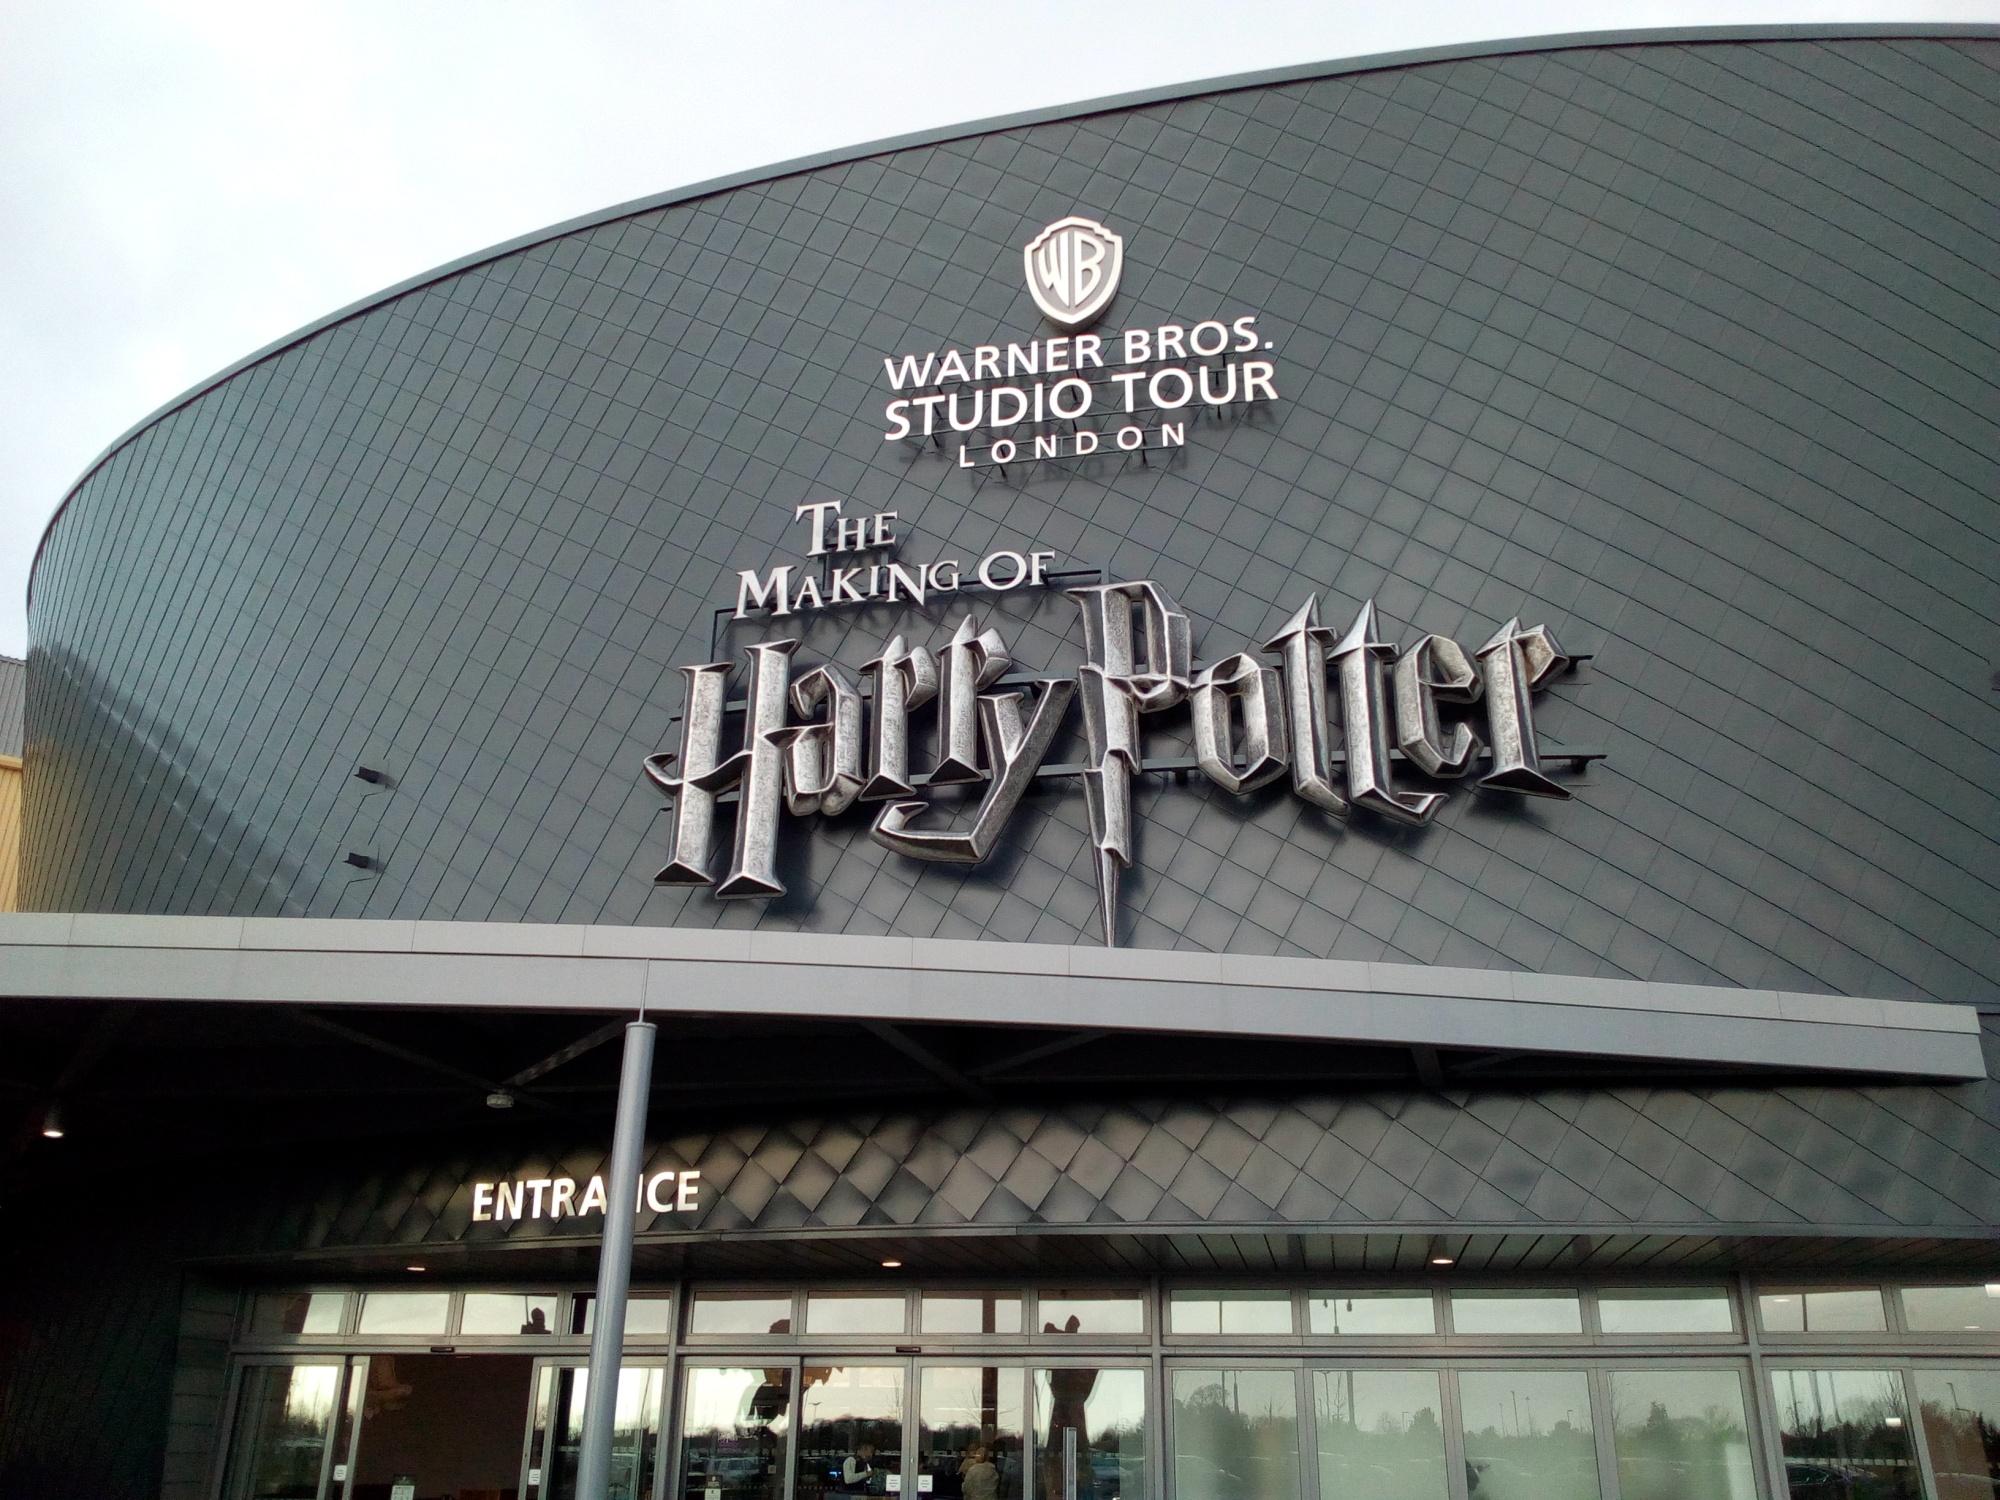 The Making of Harry Potter - Studio Tour London